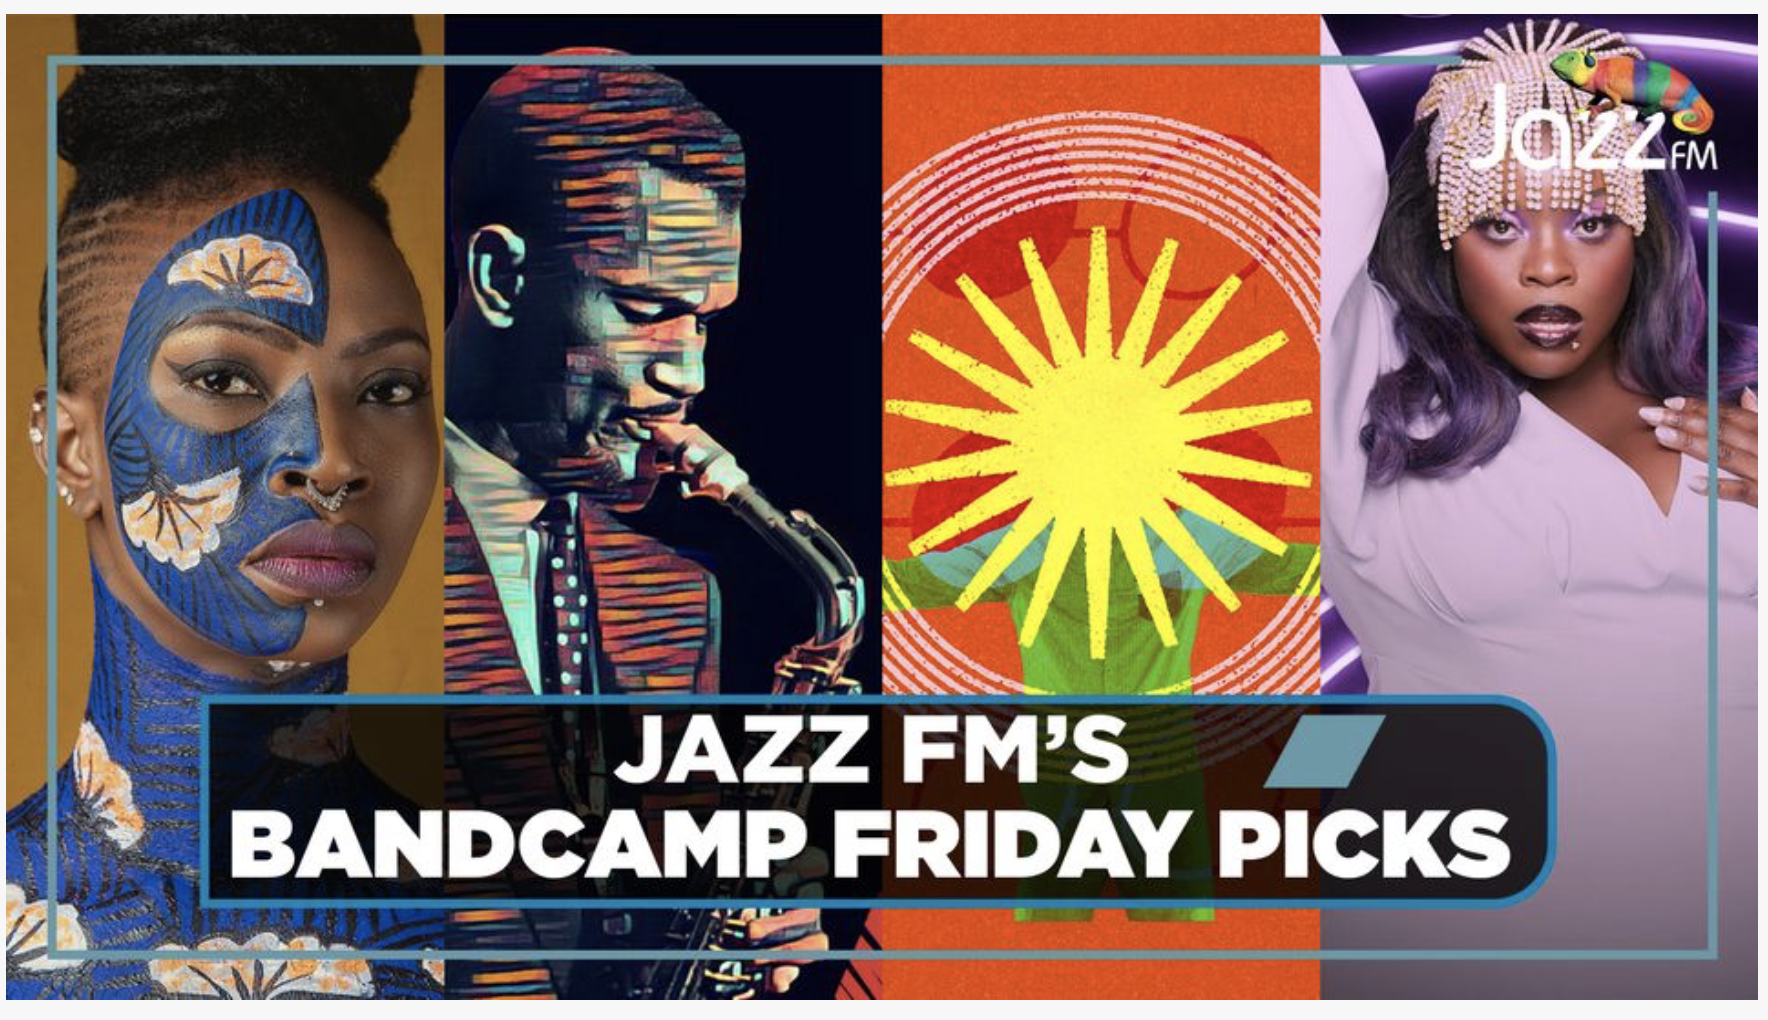 JAZZ FM's Bandcamp Fridays Picks – October 2021:  Tomoko Omura & Itay Kriss – Jazz FM